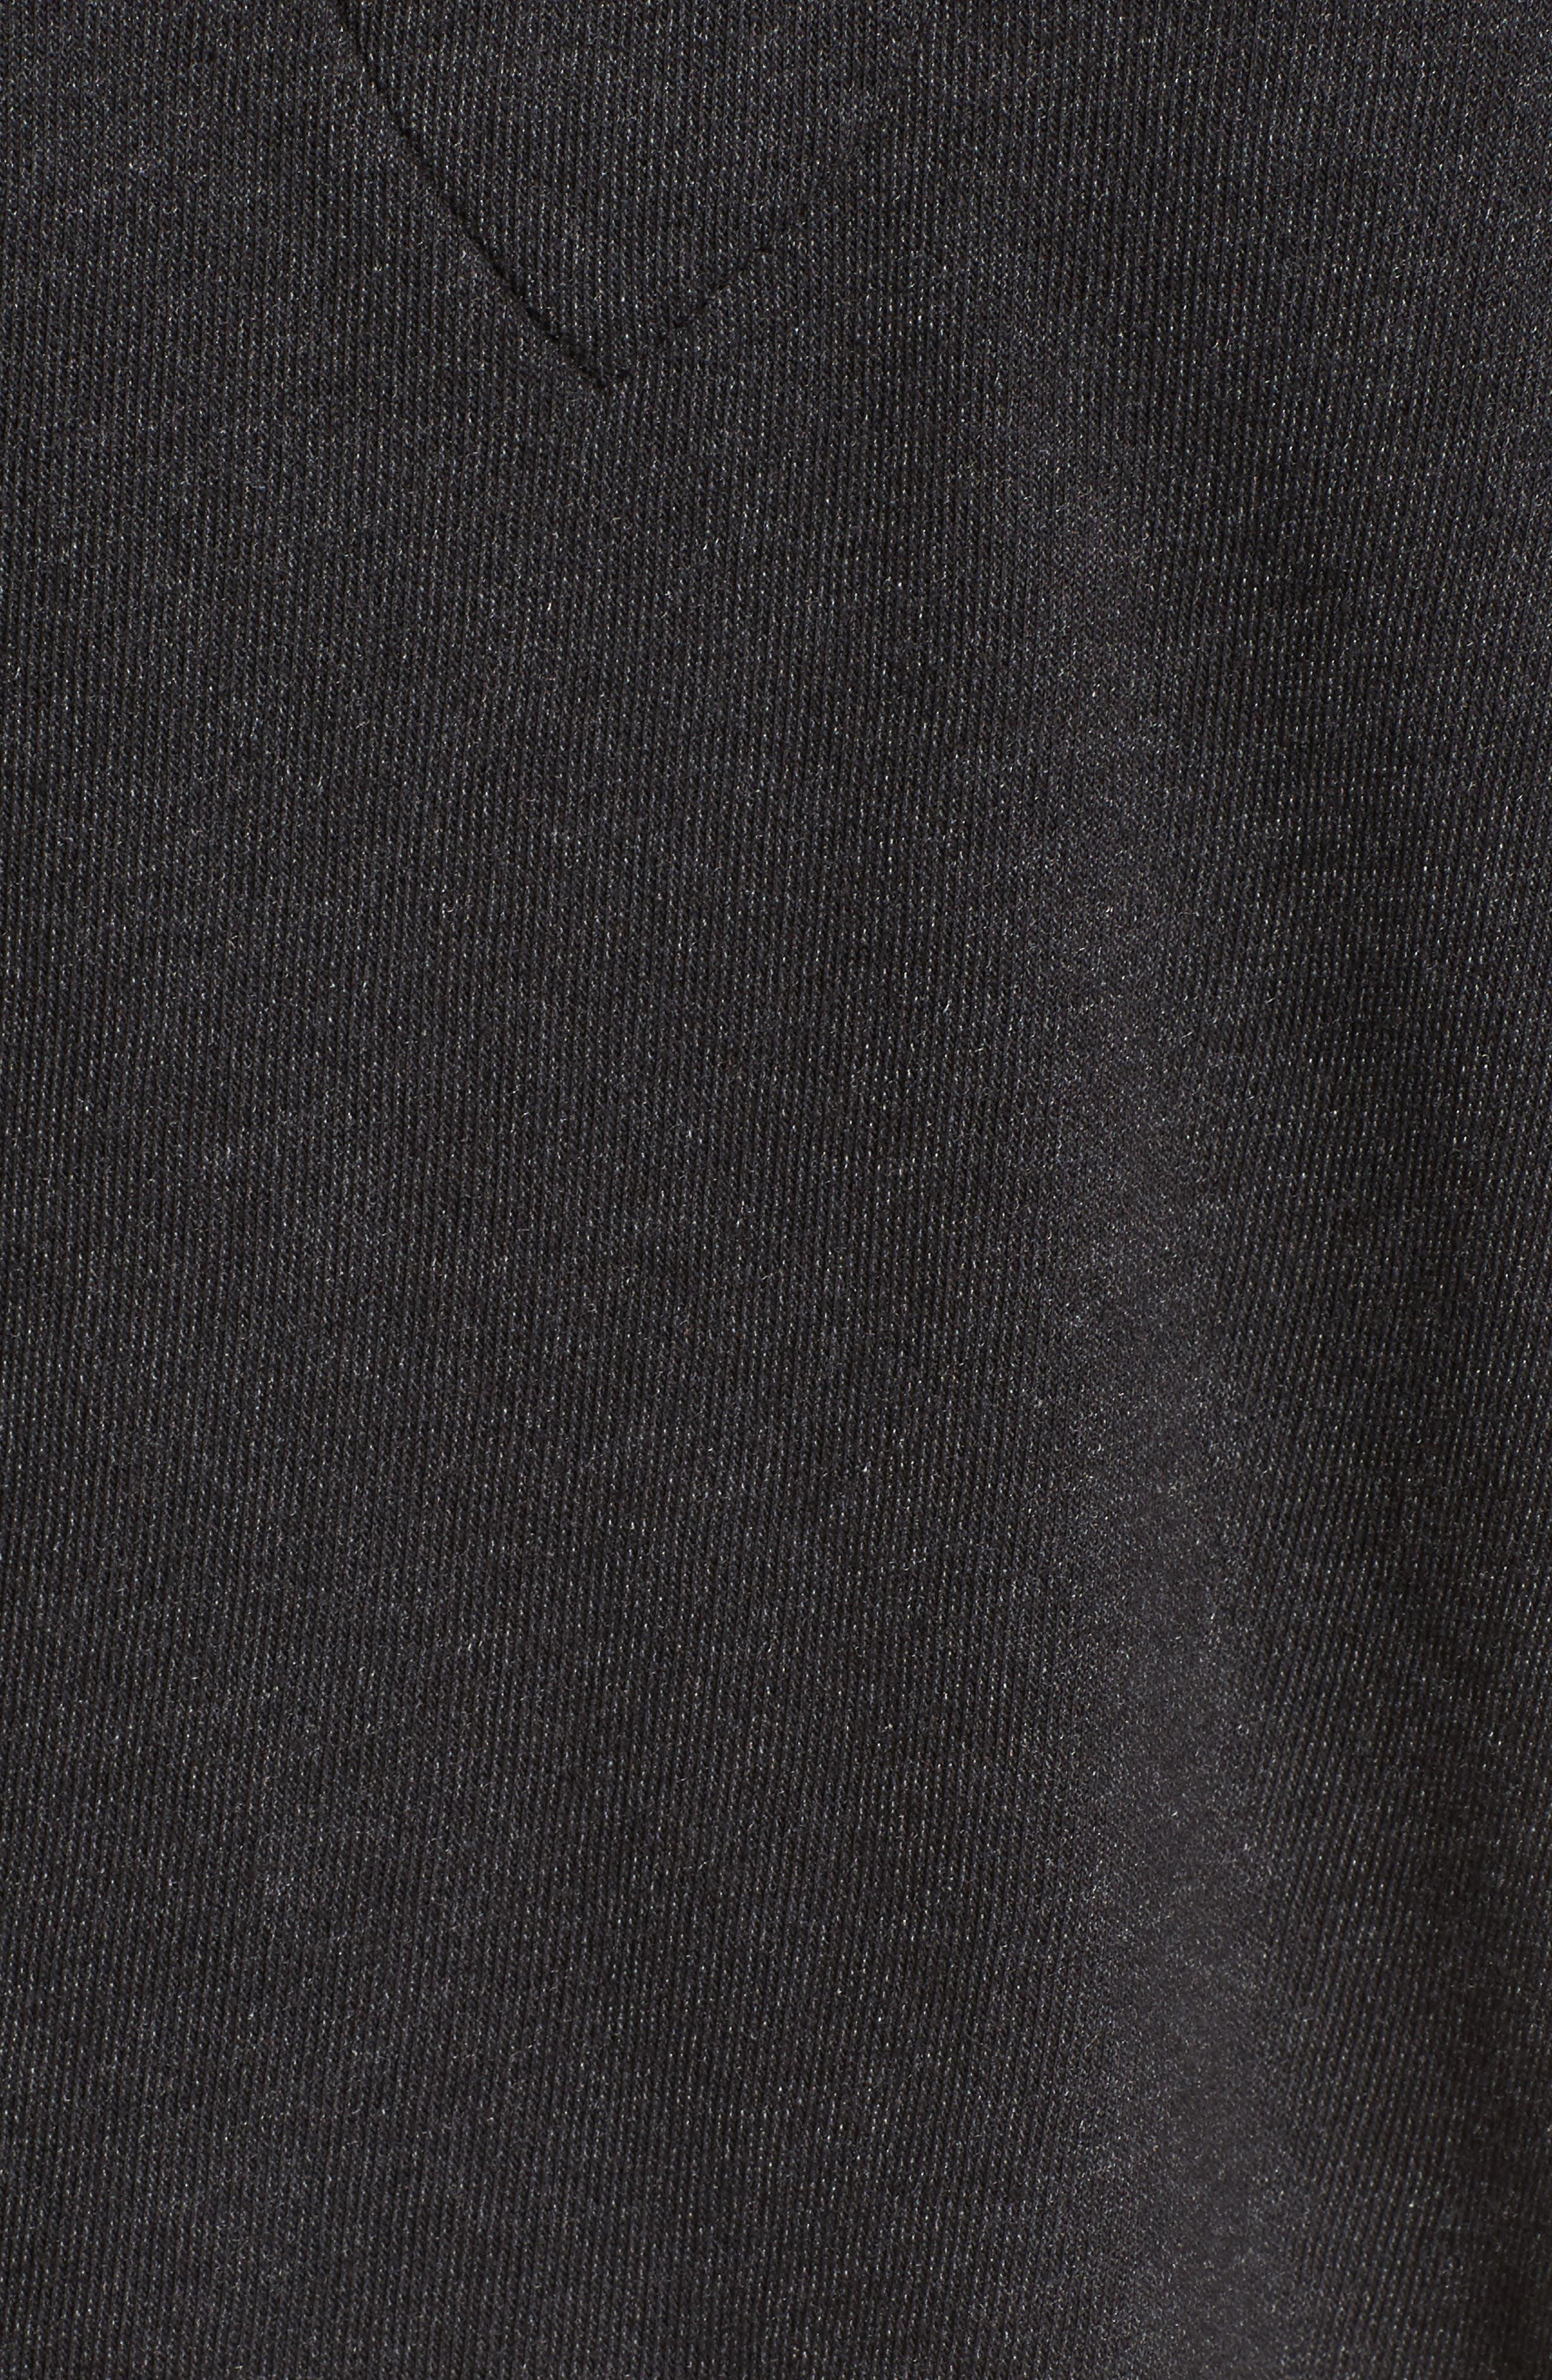 WILDFOX, Hutton Sweatshirt, Alternate thumbnail 5, color, 001